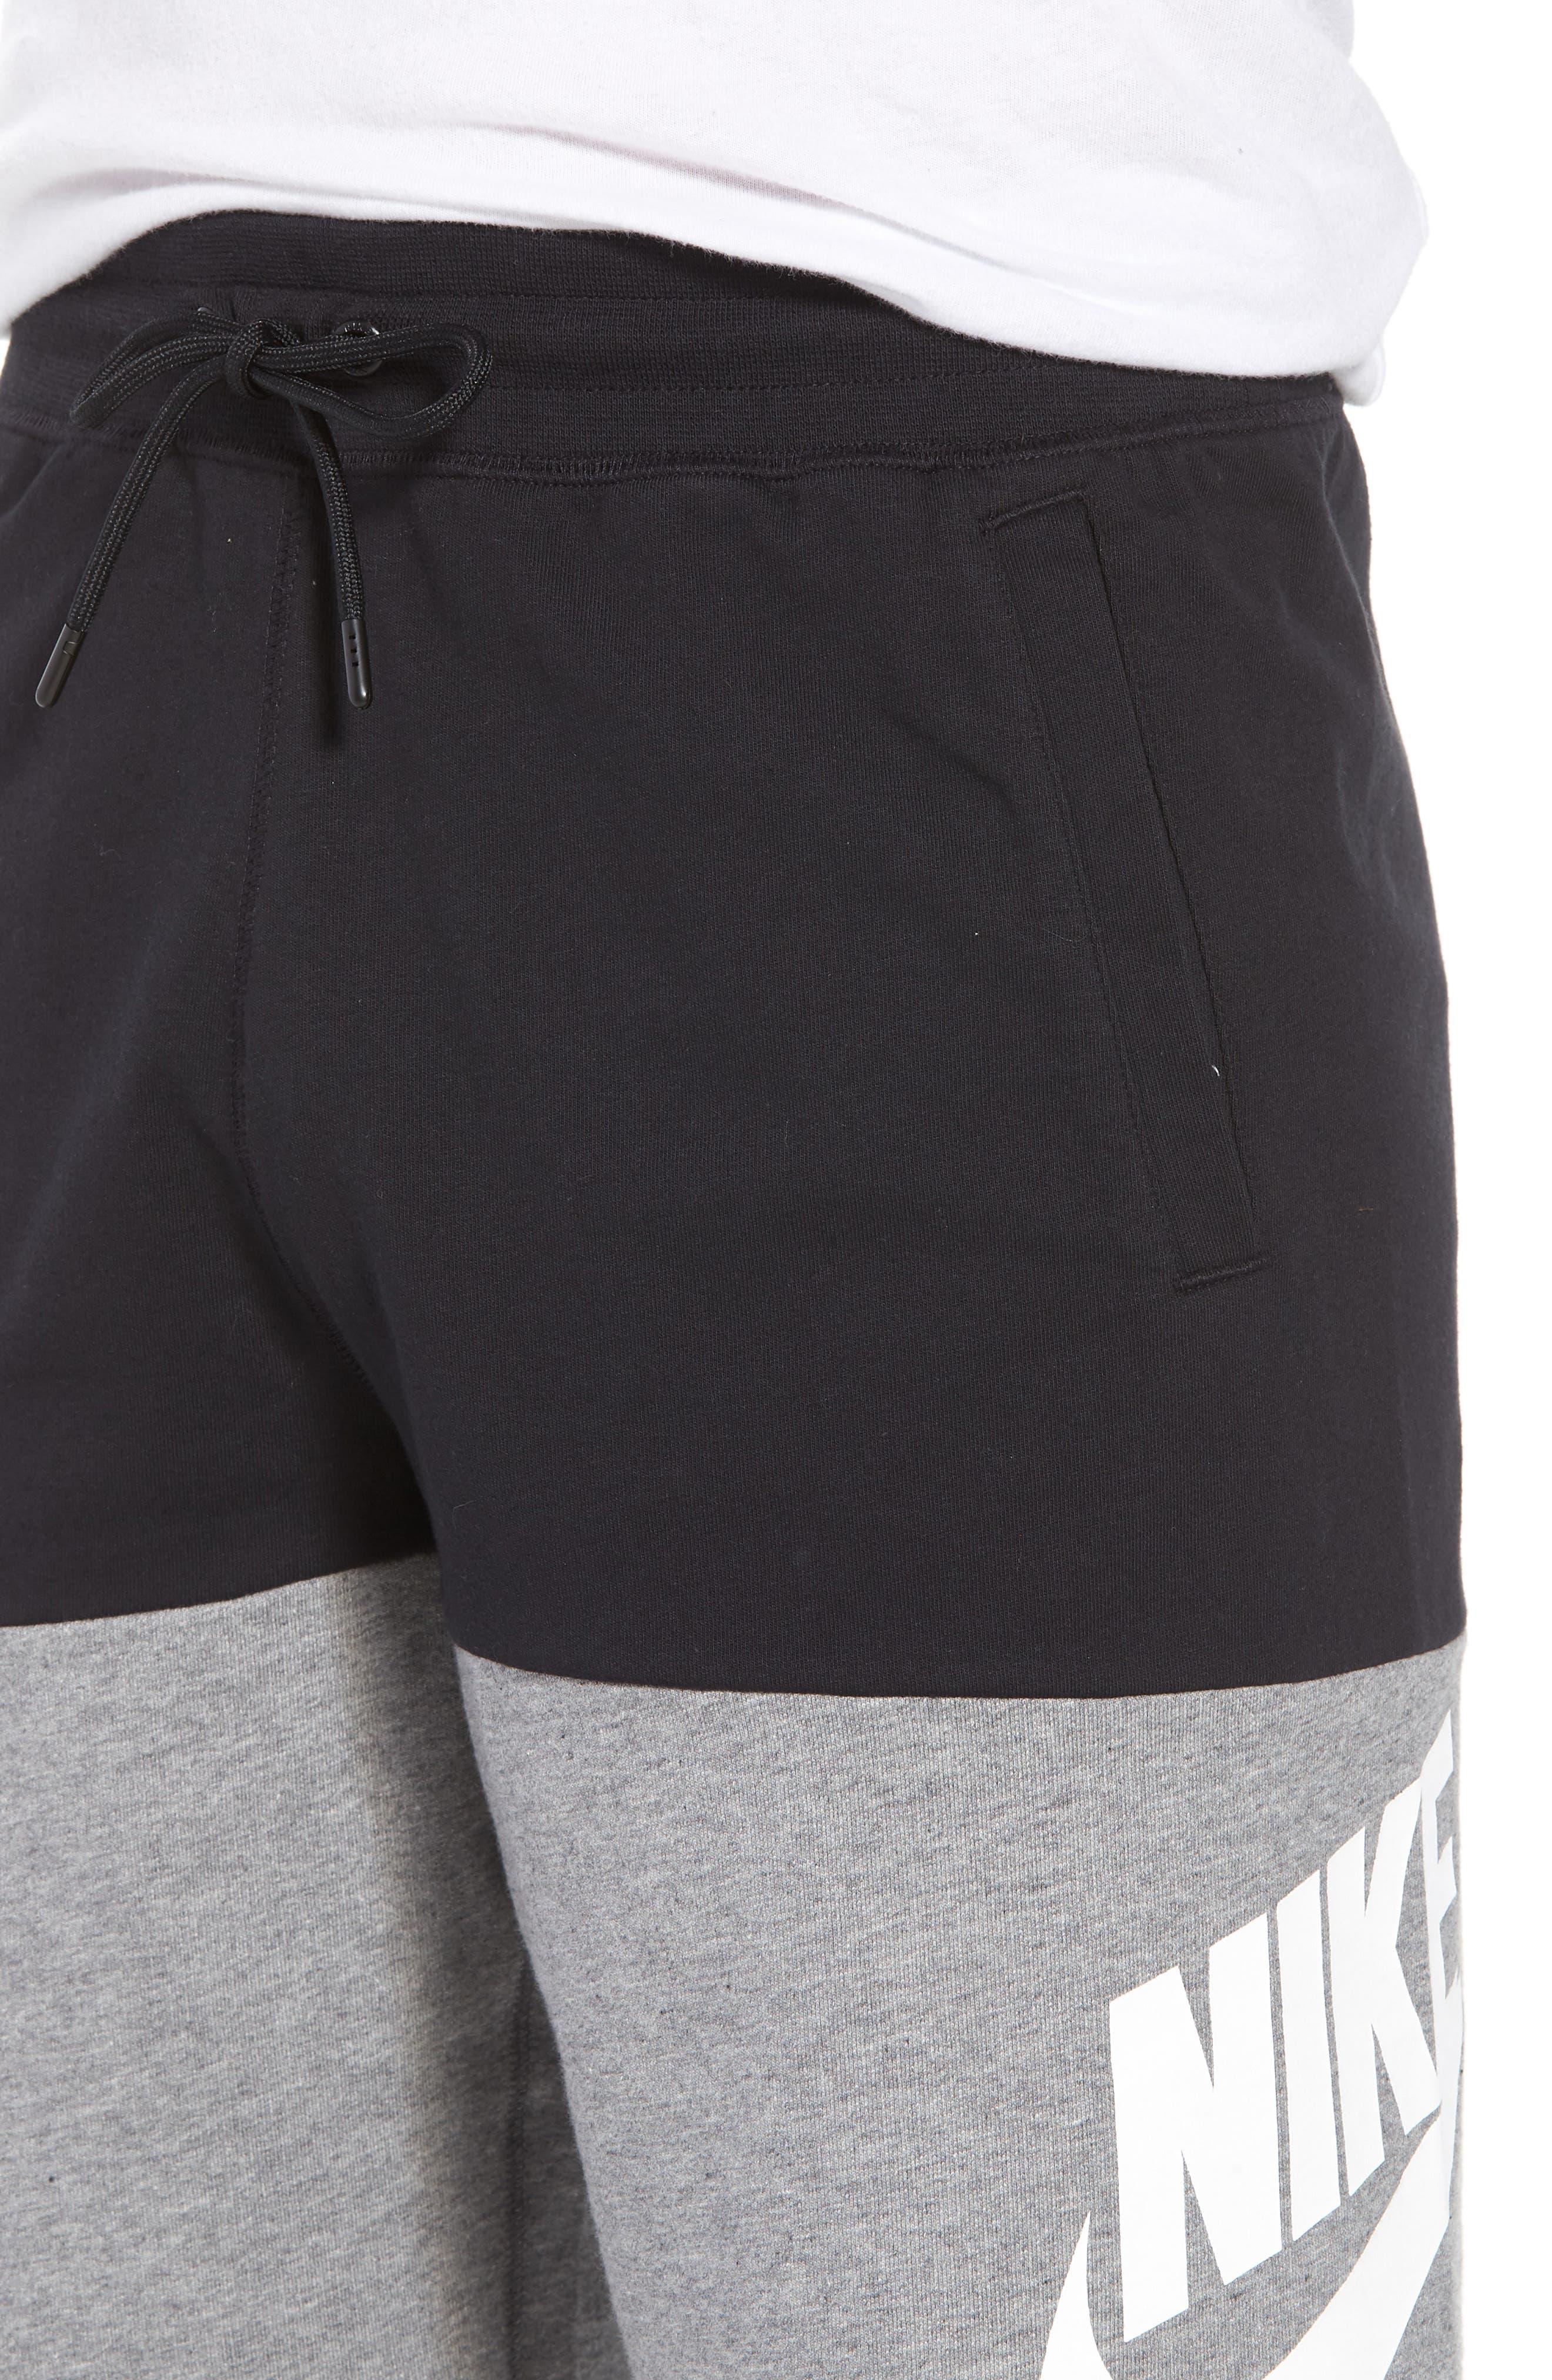 NSW Franchise GX3 Shorts,                             Alternate thumbnail 4, color,                             BLACK/ CARBON HEATHER/ WHITE